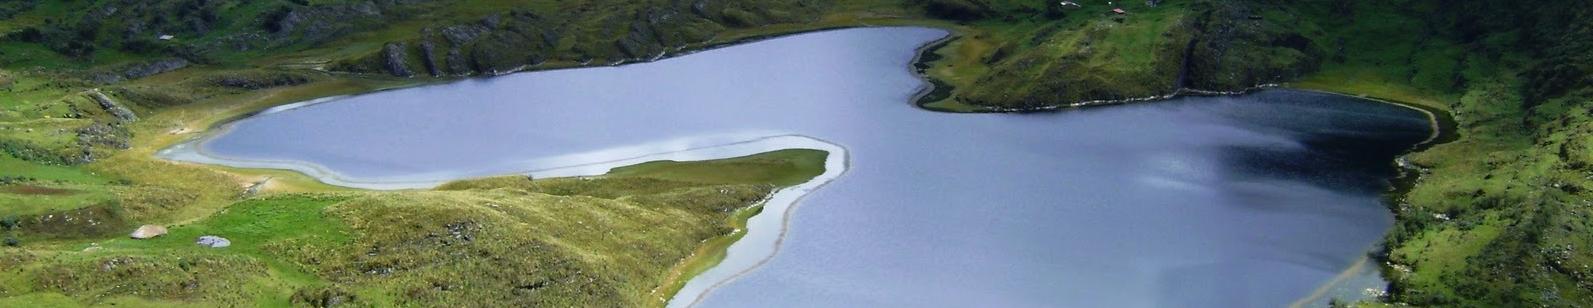 Laguna Alforjacocha copy